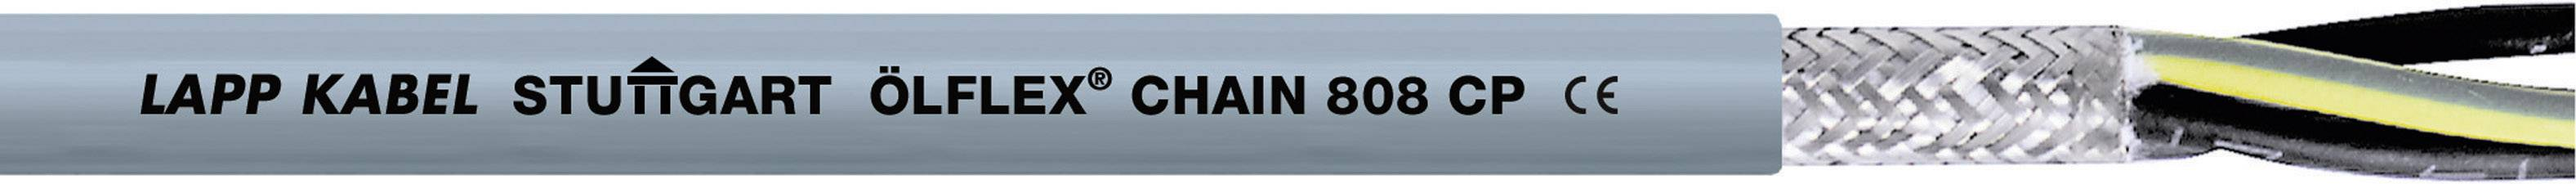 Žíla kabelu LappKabel ÖLFLEX CHAIN 808 CP 5G1,0 (1027770), 5x 1 mm², polyurethan, Ø 8,3 mm, stíněný, 50 m, šed